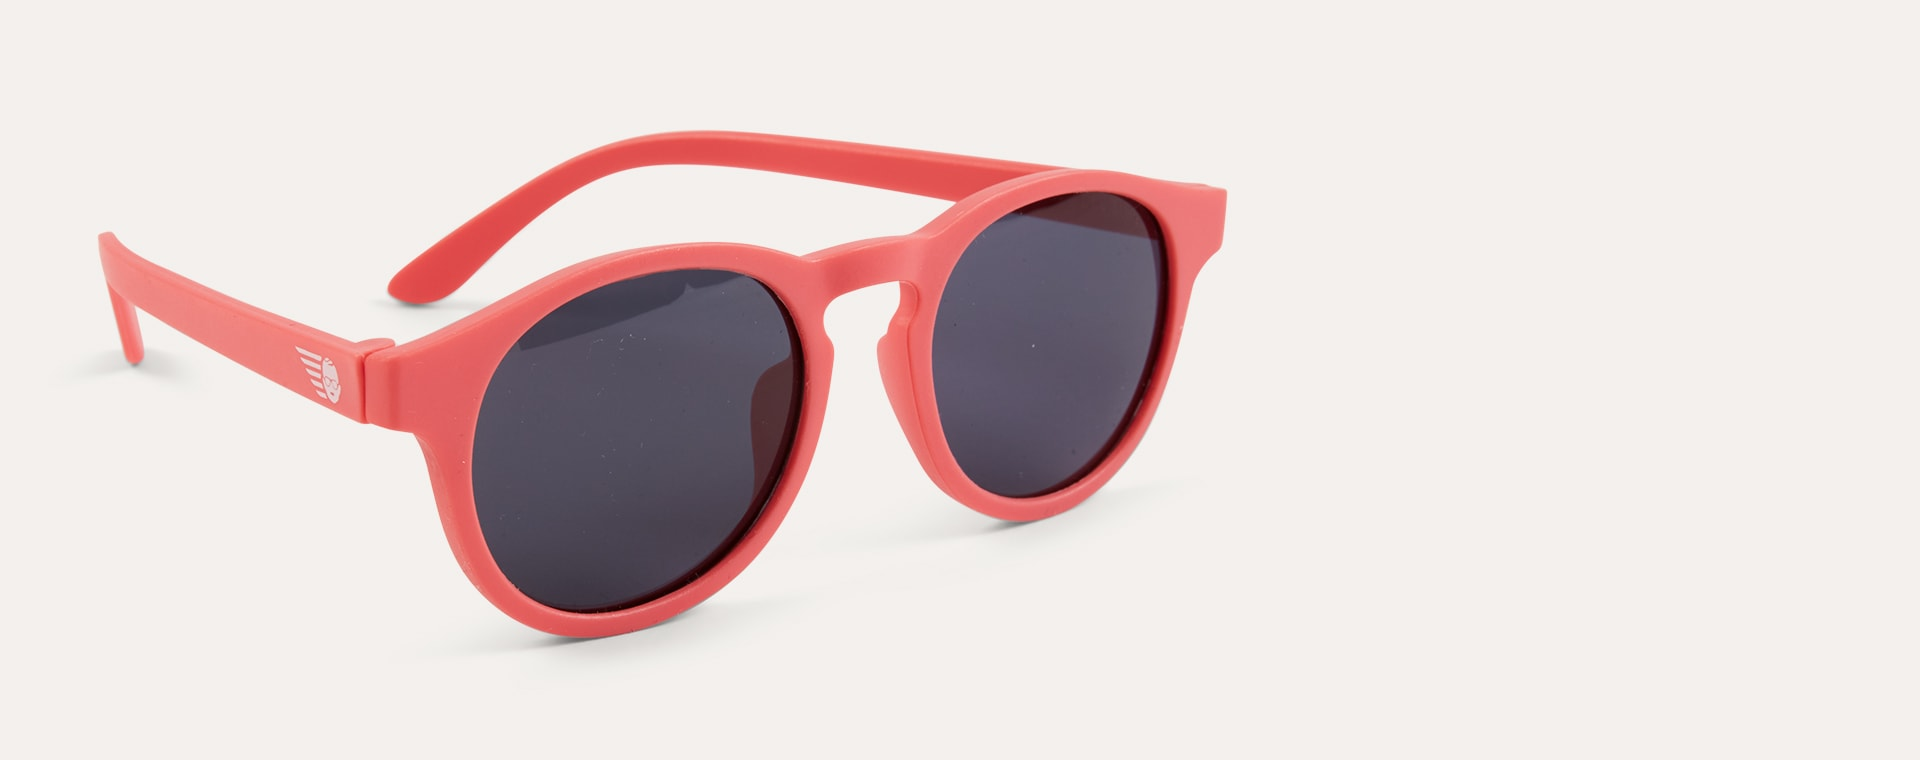 Wonderfully Watermelon Babiators Limited Edition Keyhole Sunglasses